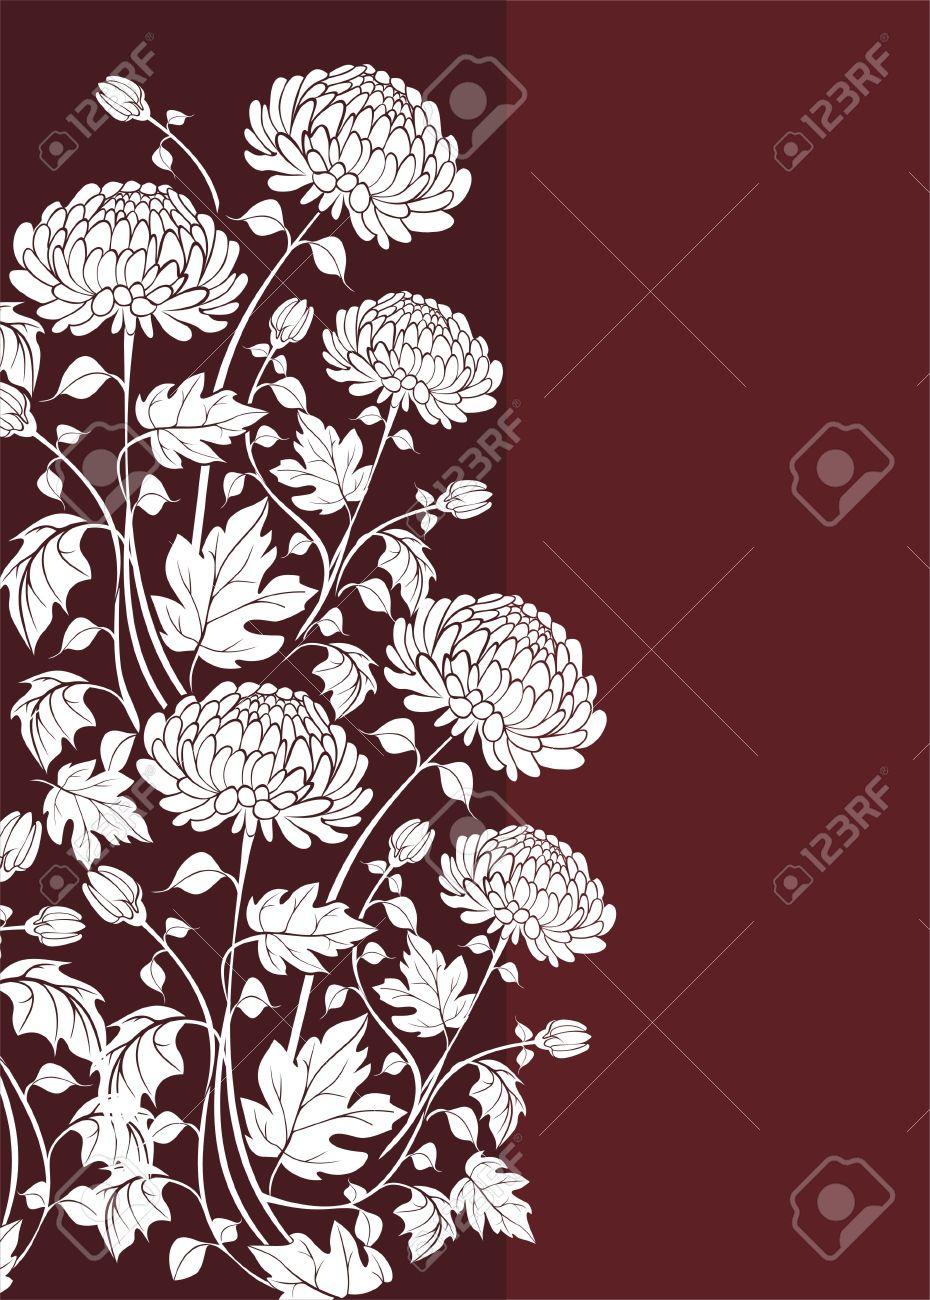 Elegant  flower background with chrysanthemums Stock Vector - 21744944